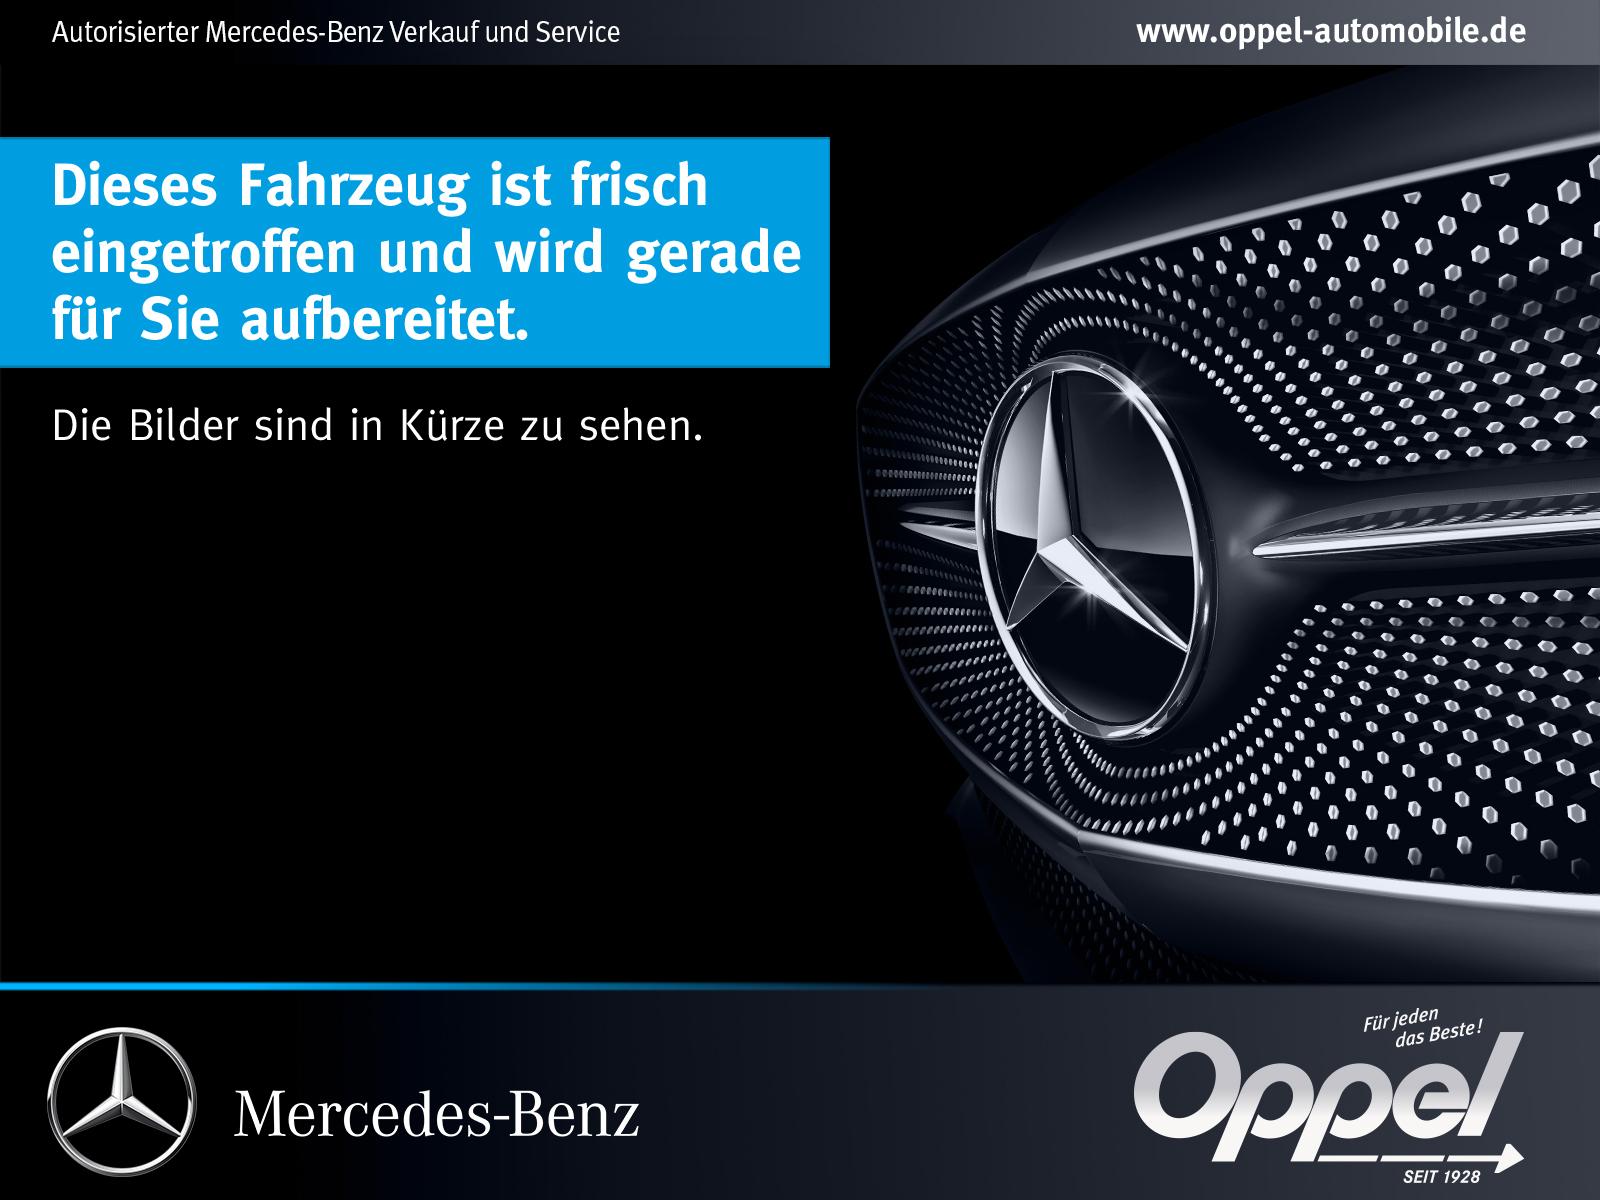 Mercedes-Benz SL 63 AMG LED+KLIMA+DAB+RFK+HarmanKardonSystem, Jahr 2017, Benzin